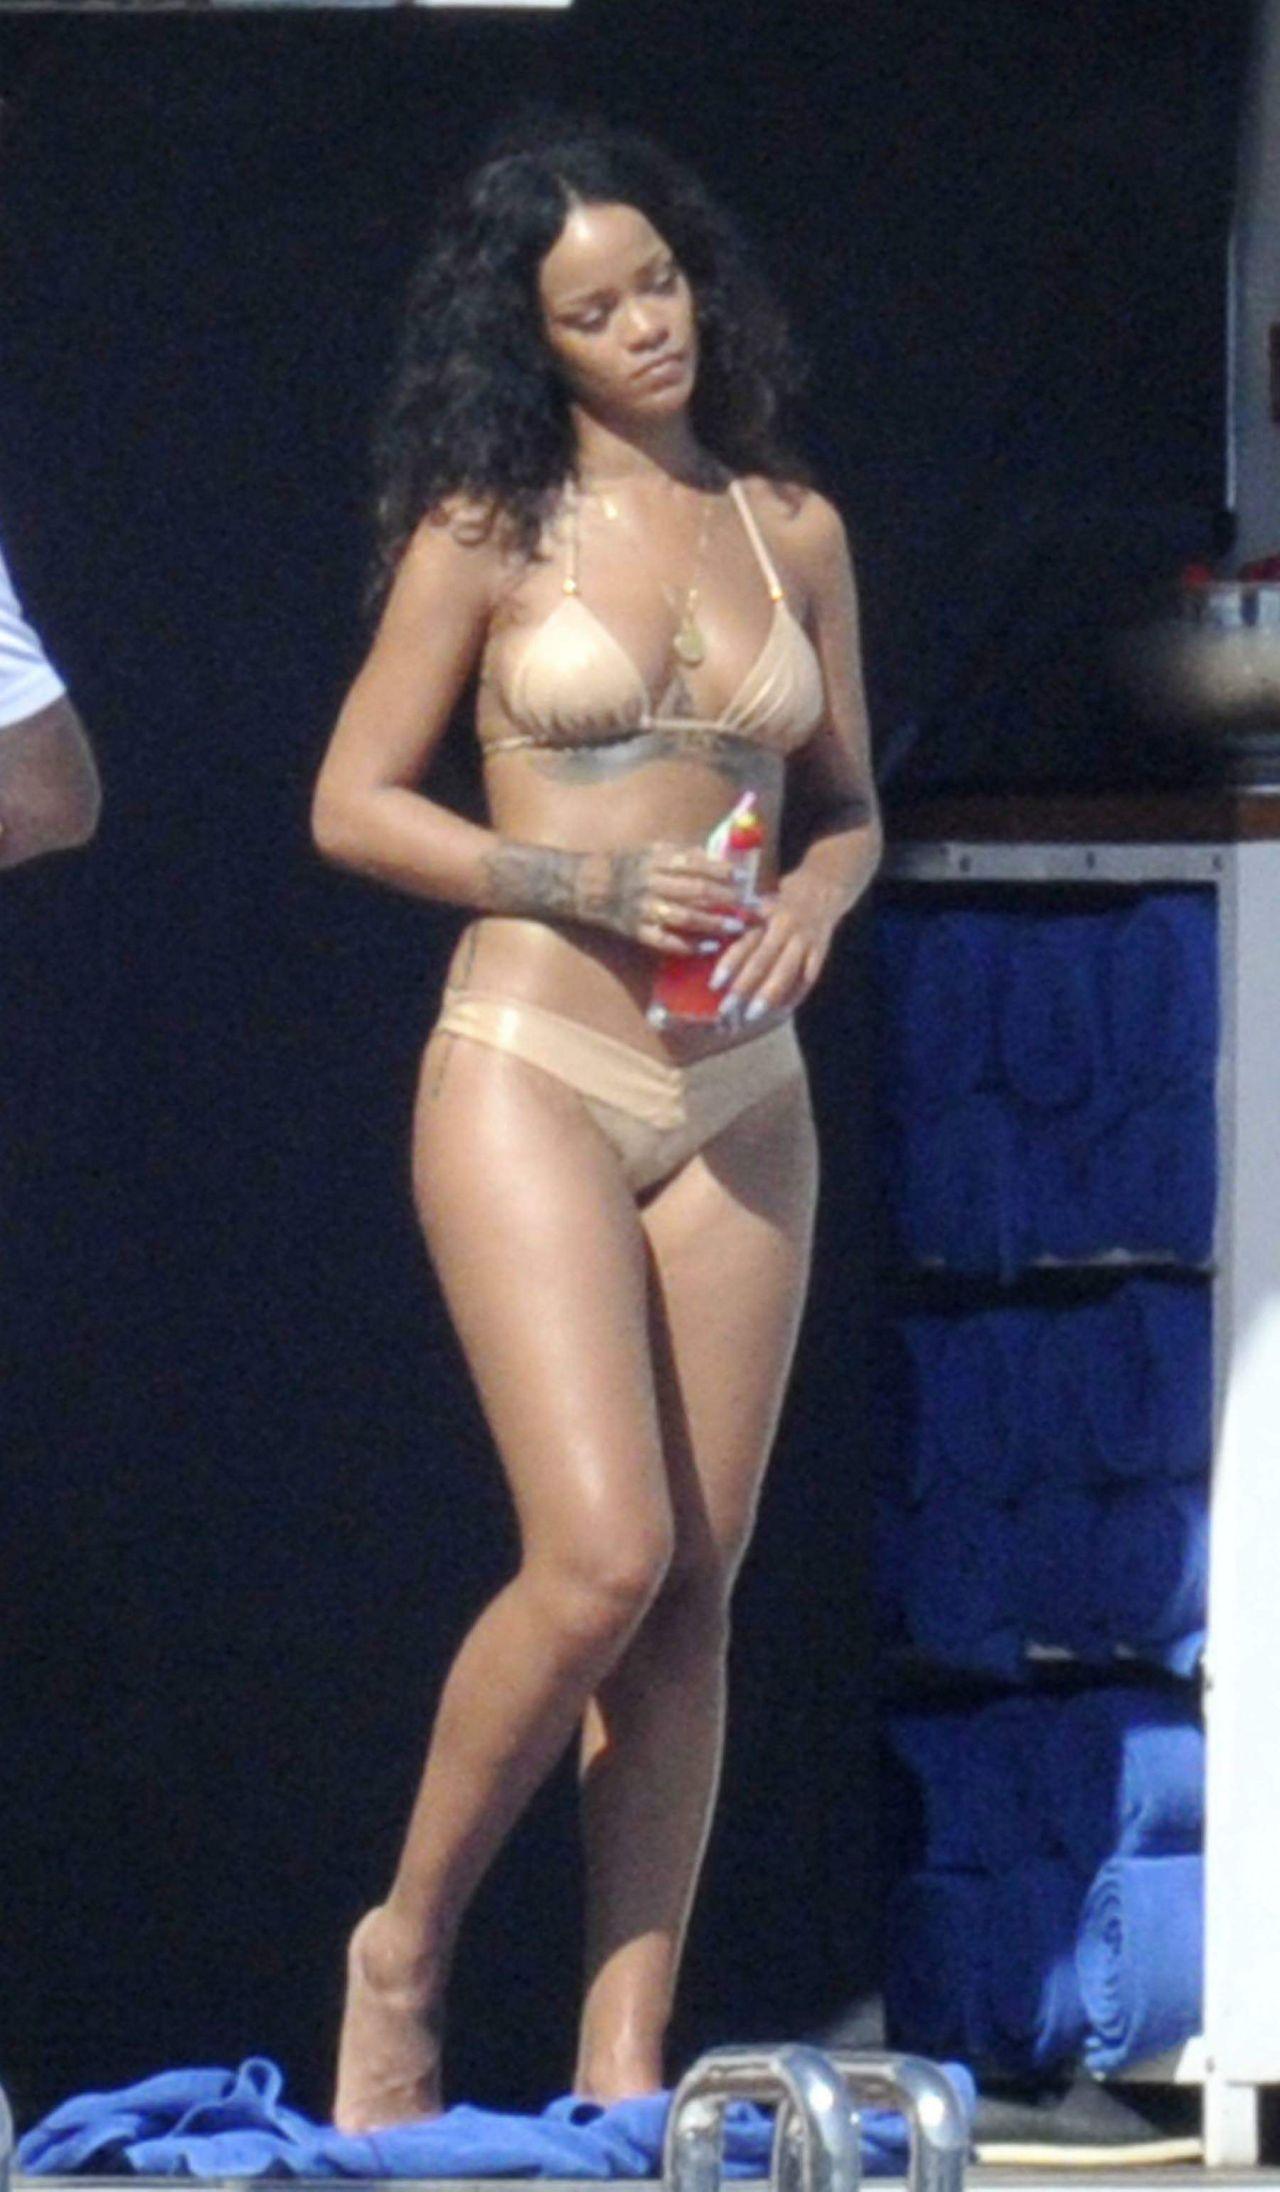 Wallpaper Tennis Girl Rihanna In A Bikini Paddleboarding In Italy August 2014